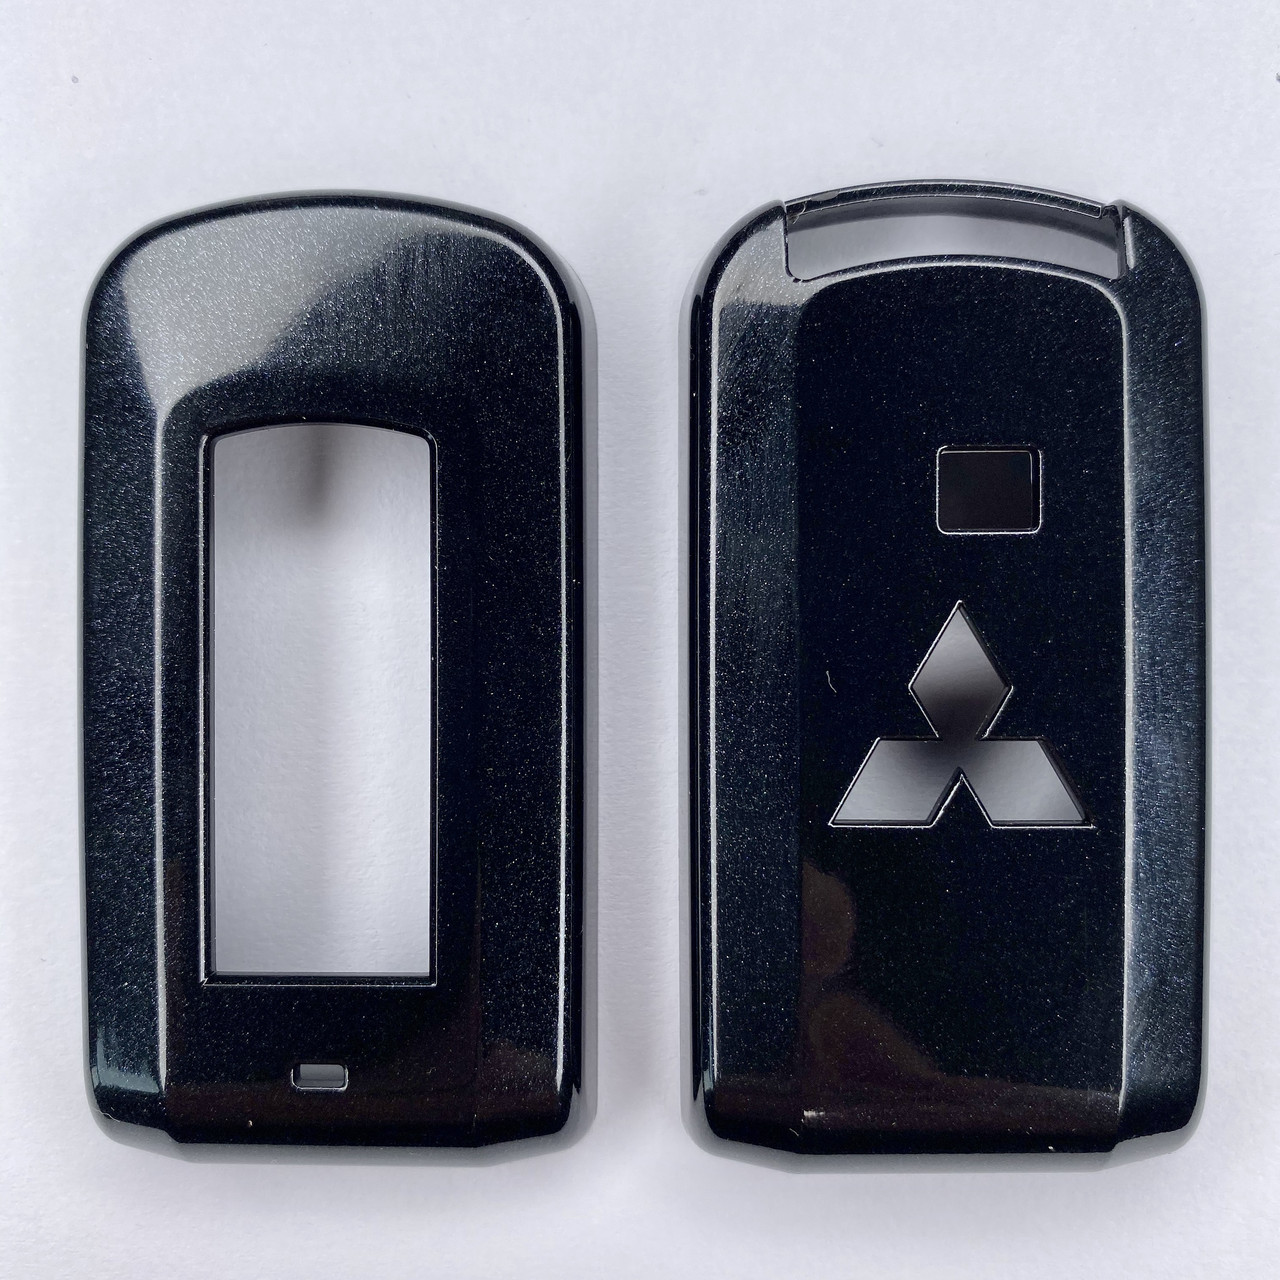 Пластиковый чехол для ключа Mitsubishi Grandis,Pajero Wagon,Sport,Lancer,Outlander